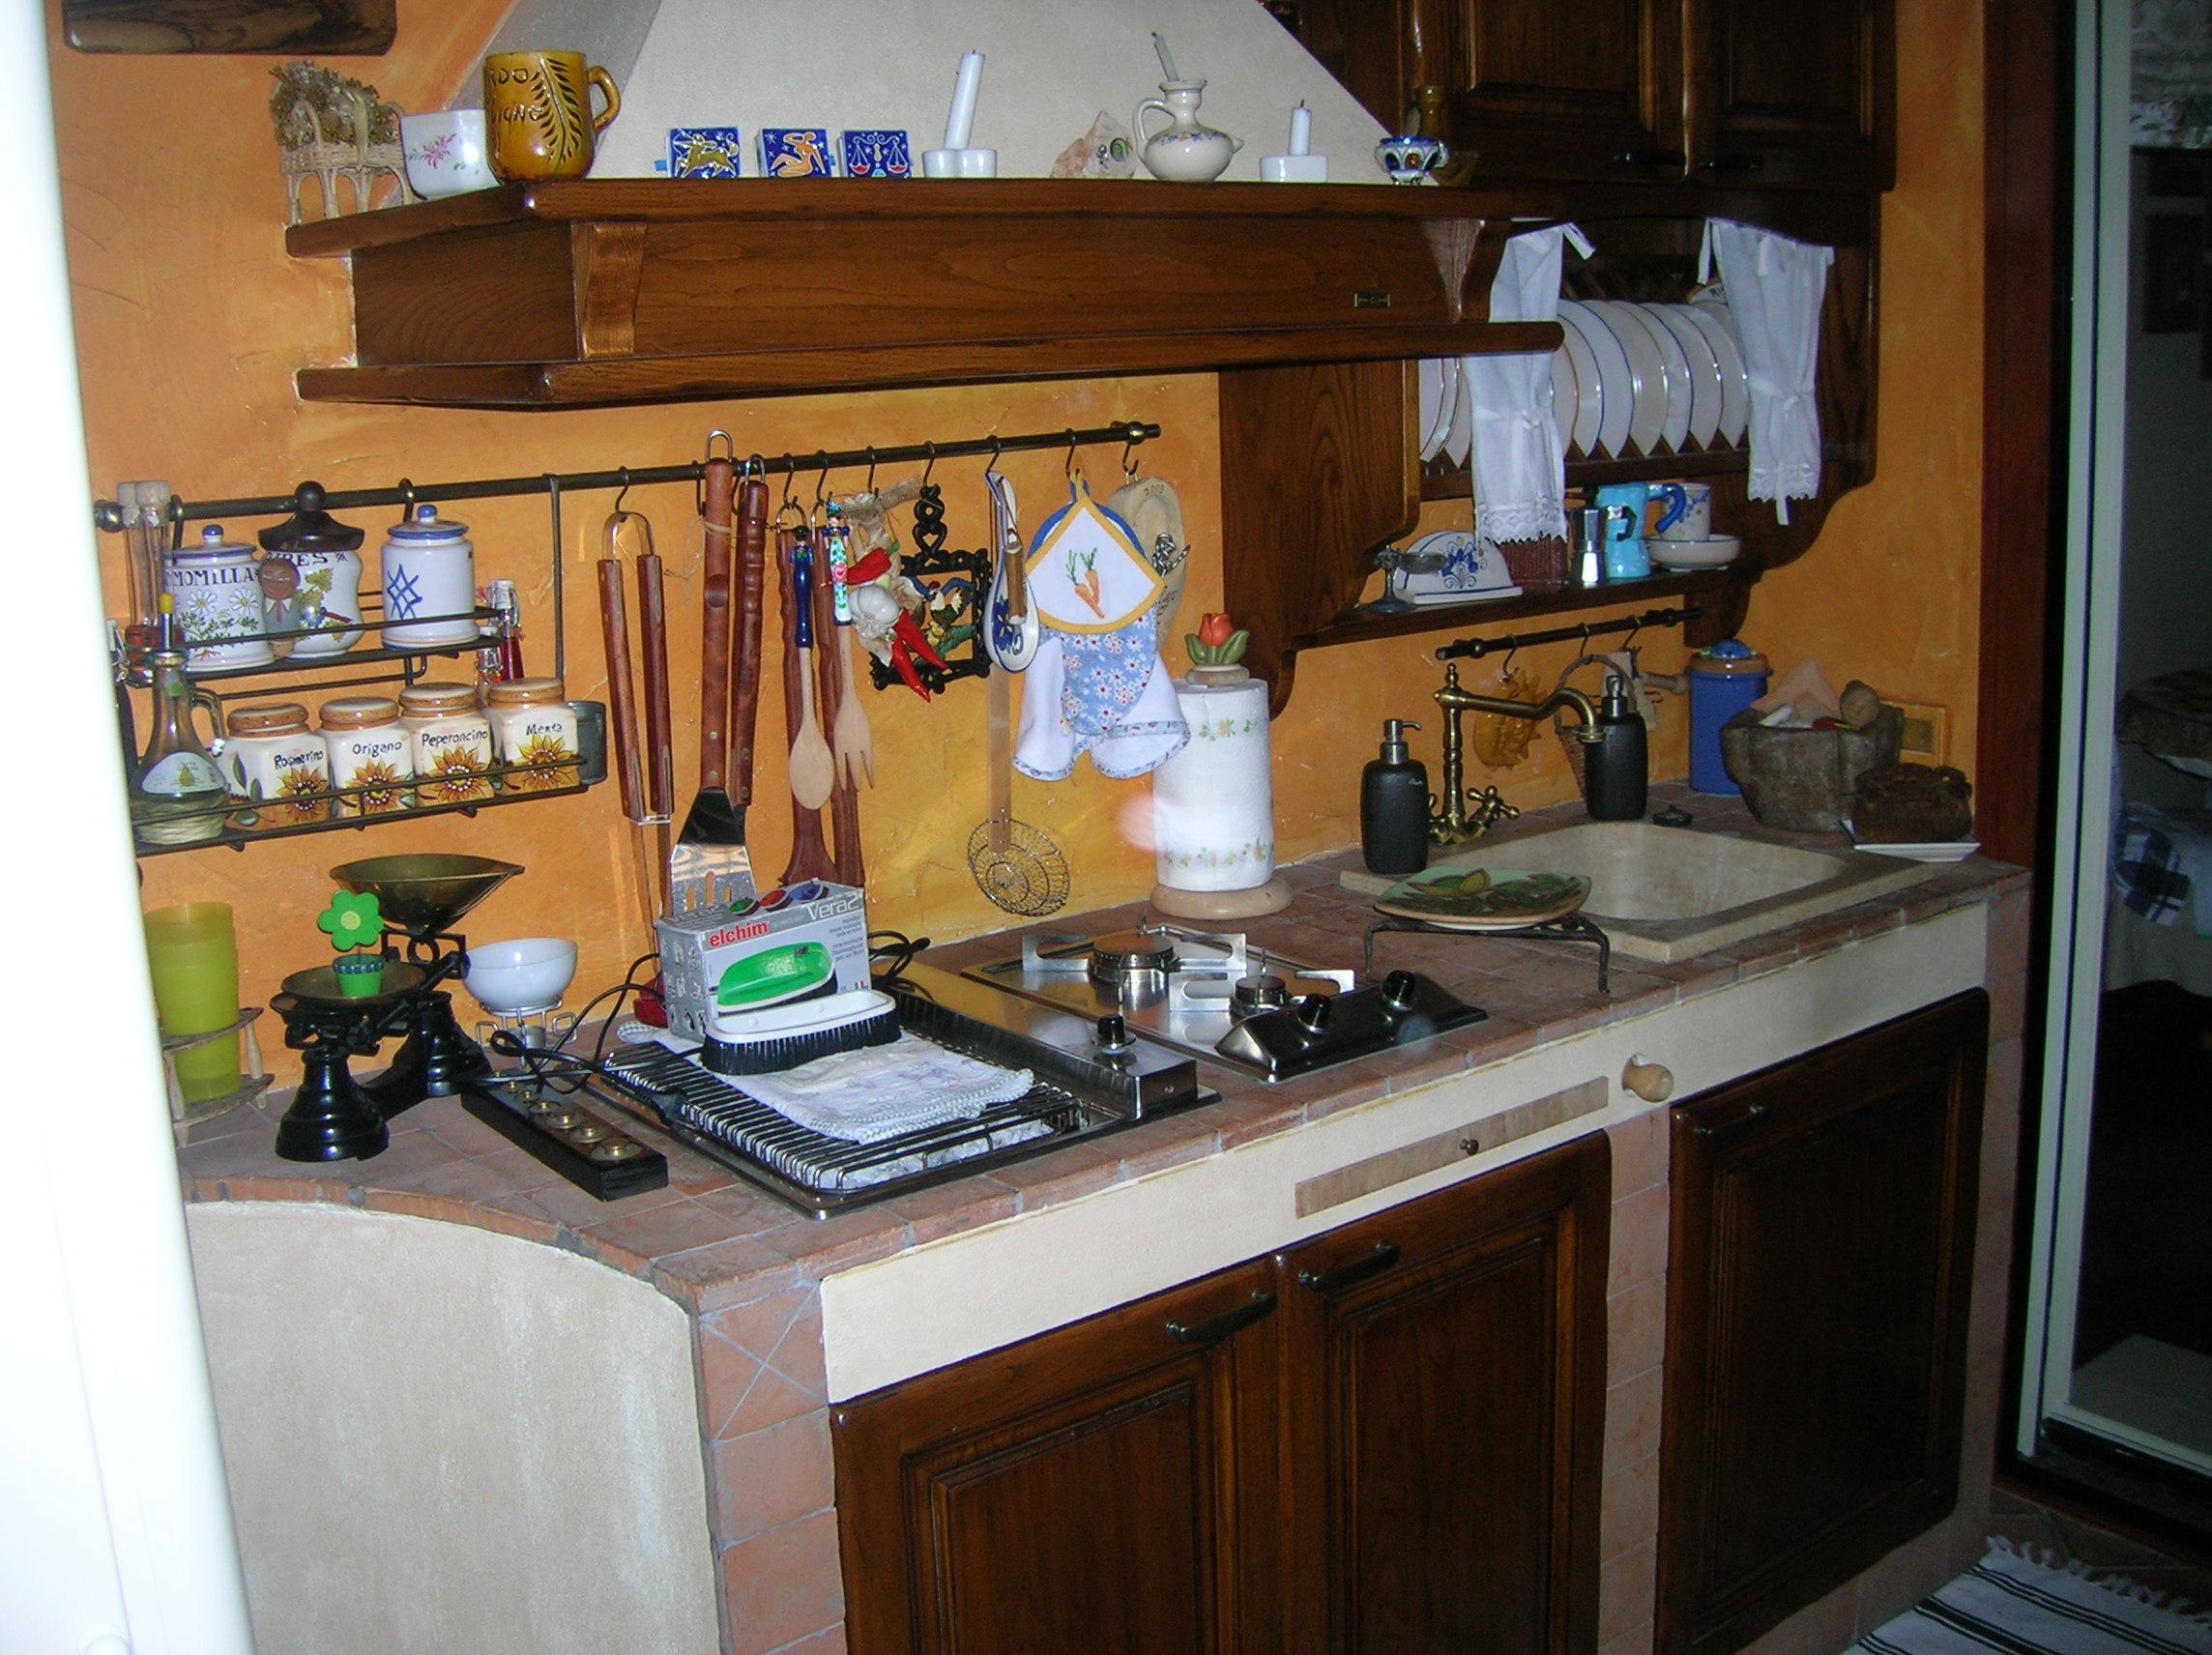 Cucine Esterne Giardino Ikea ~ duylinh for